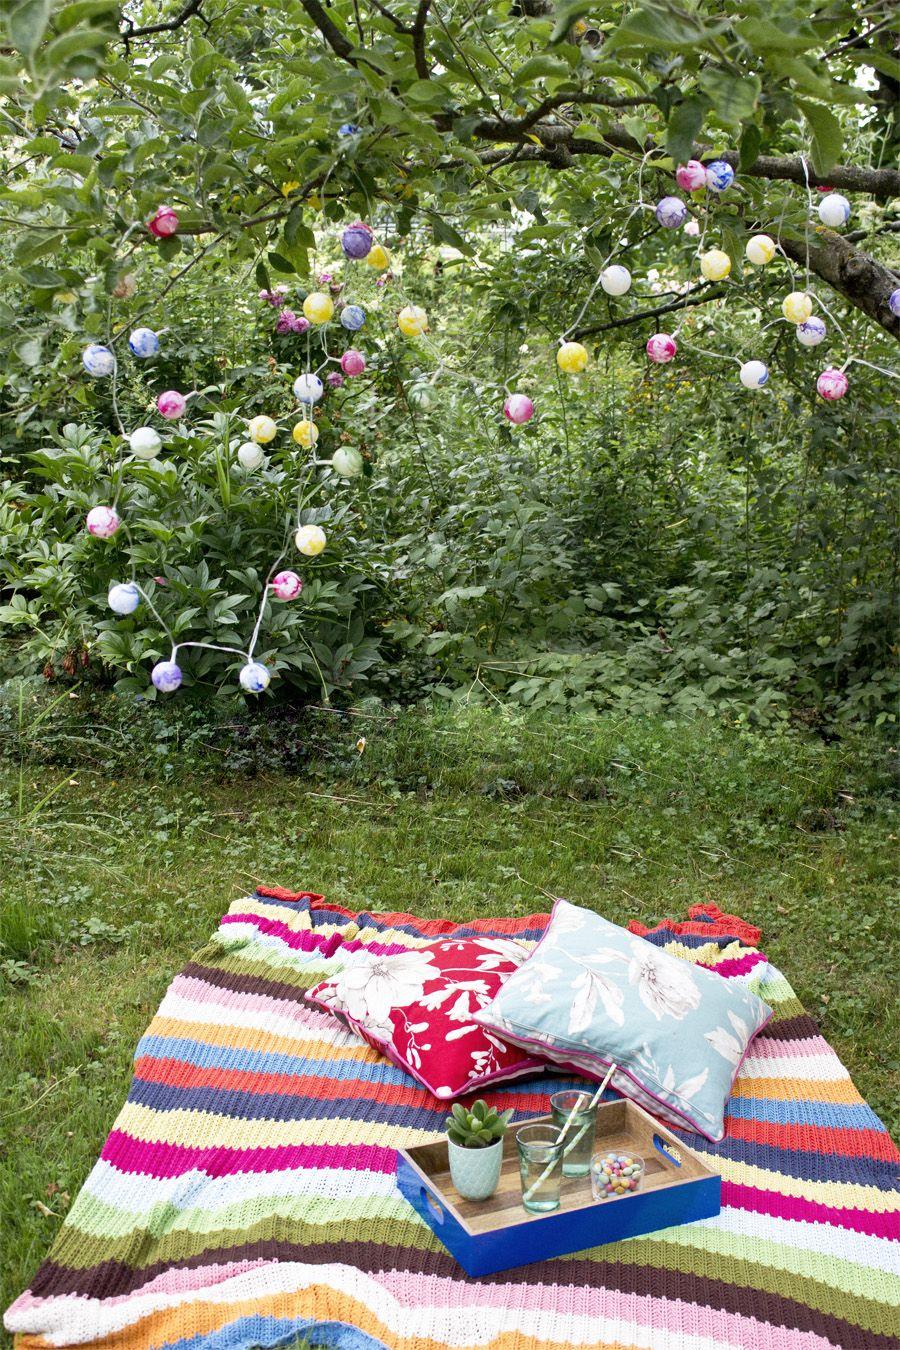 Lichterkette Fuer Den Garten Selber Basteln Look What I Made